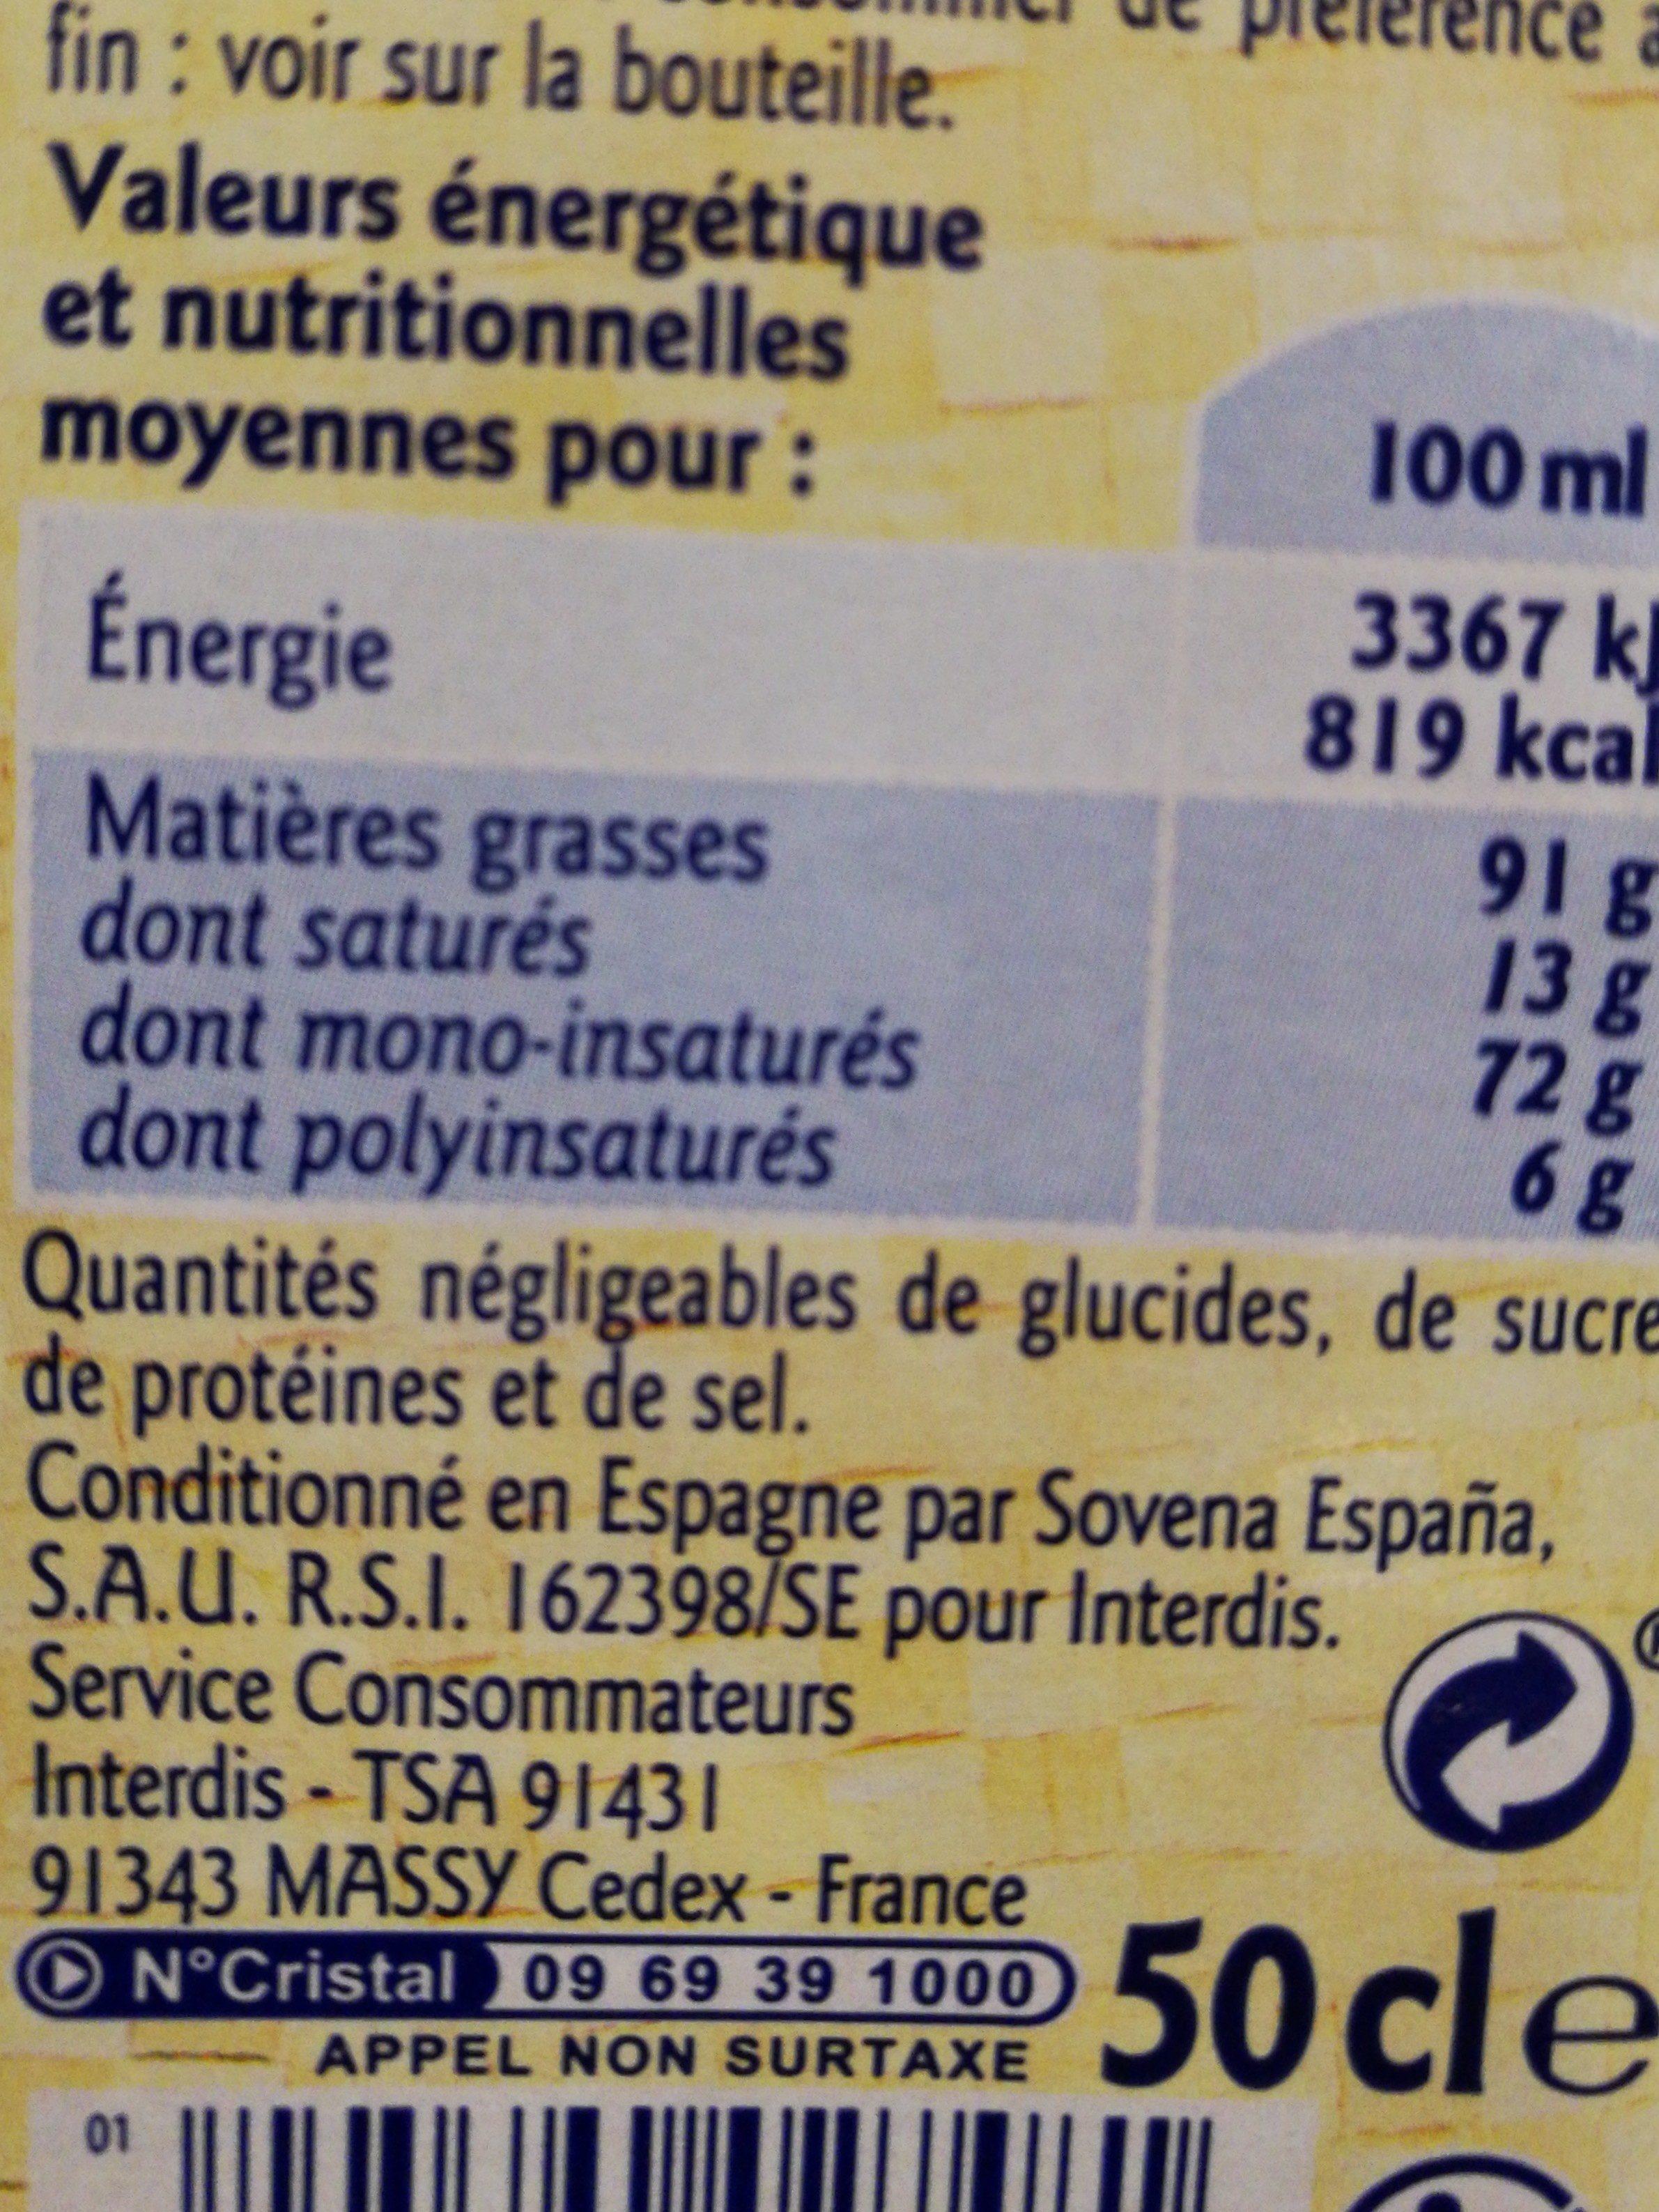 Huile d'olive vierge extra extraite à froid - Informations nutritionnelles - fr